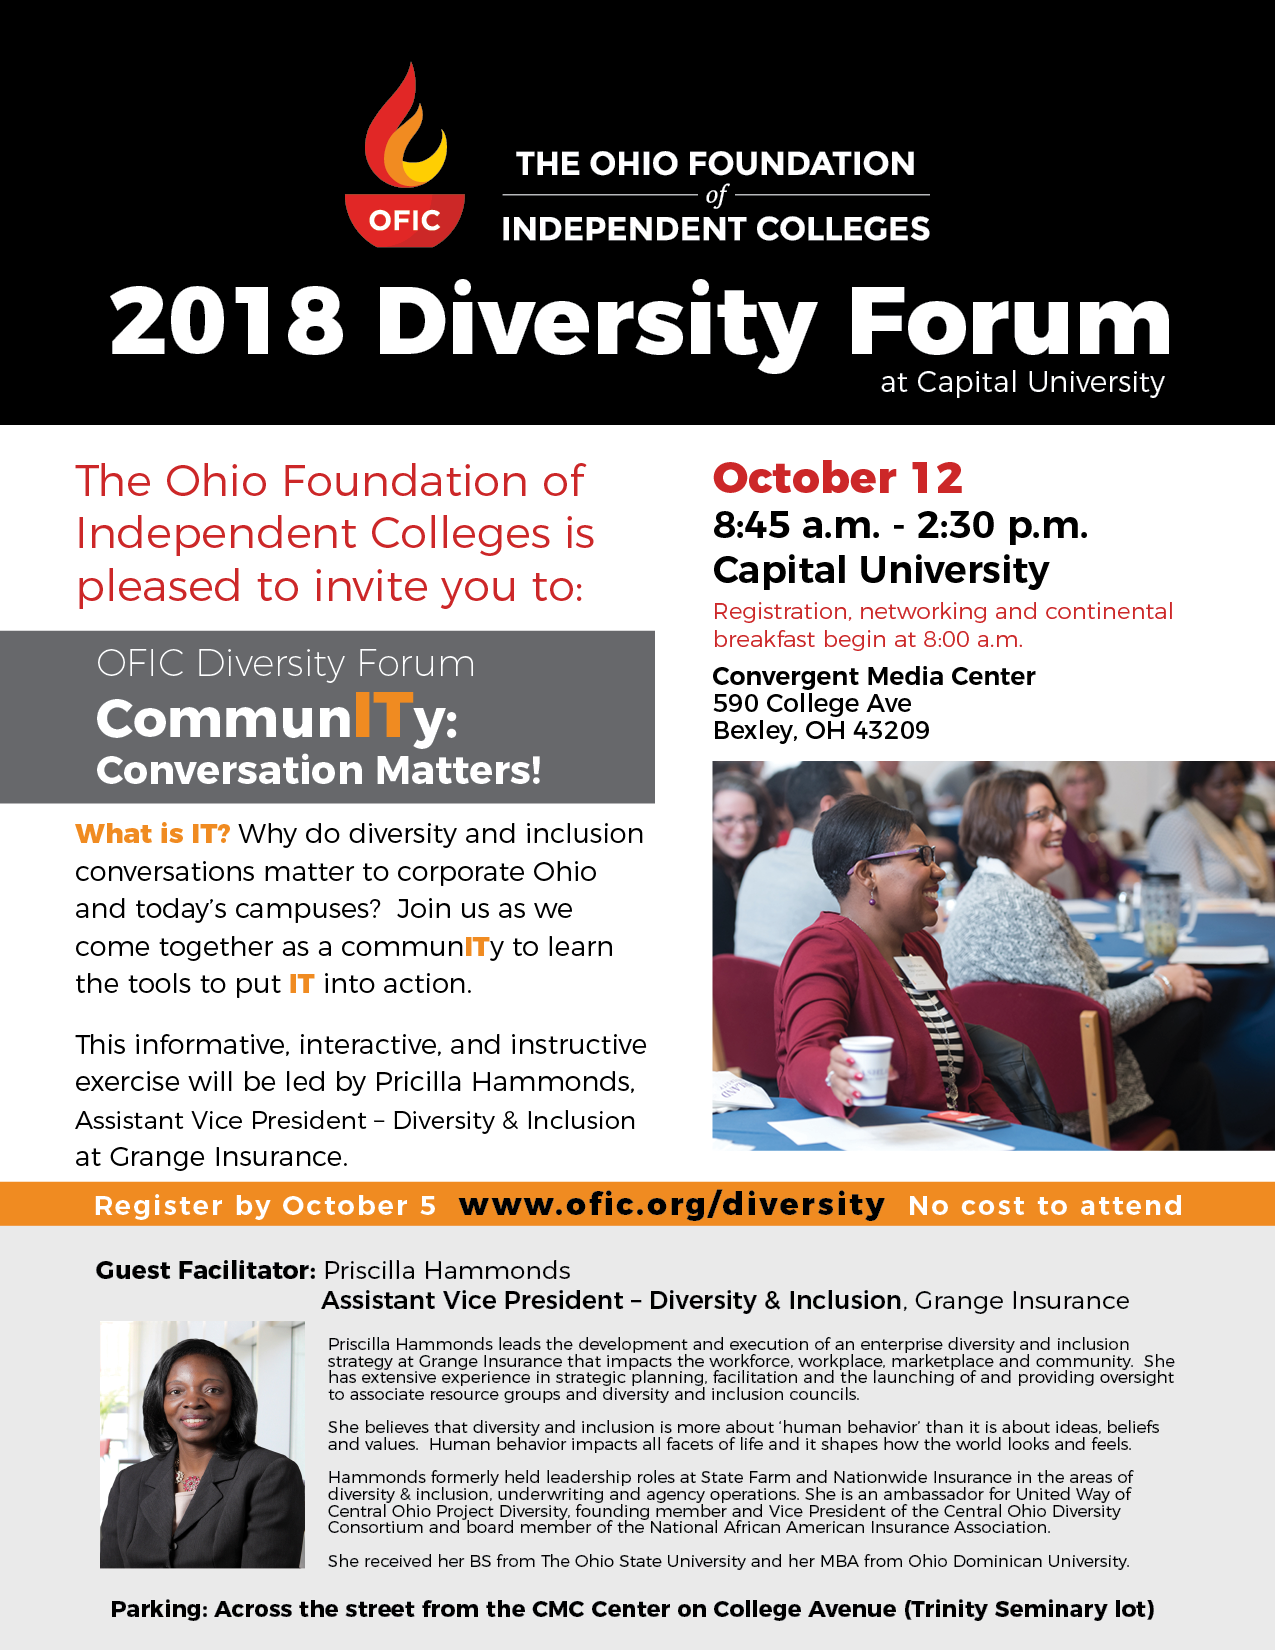 2018 Diversity Forum Invite.png